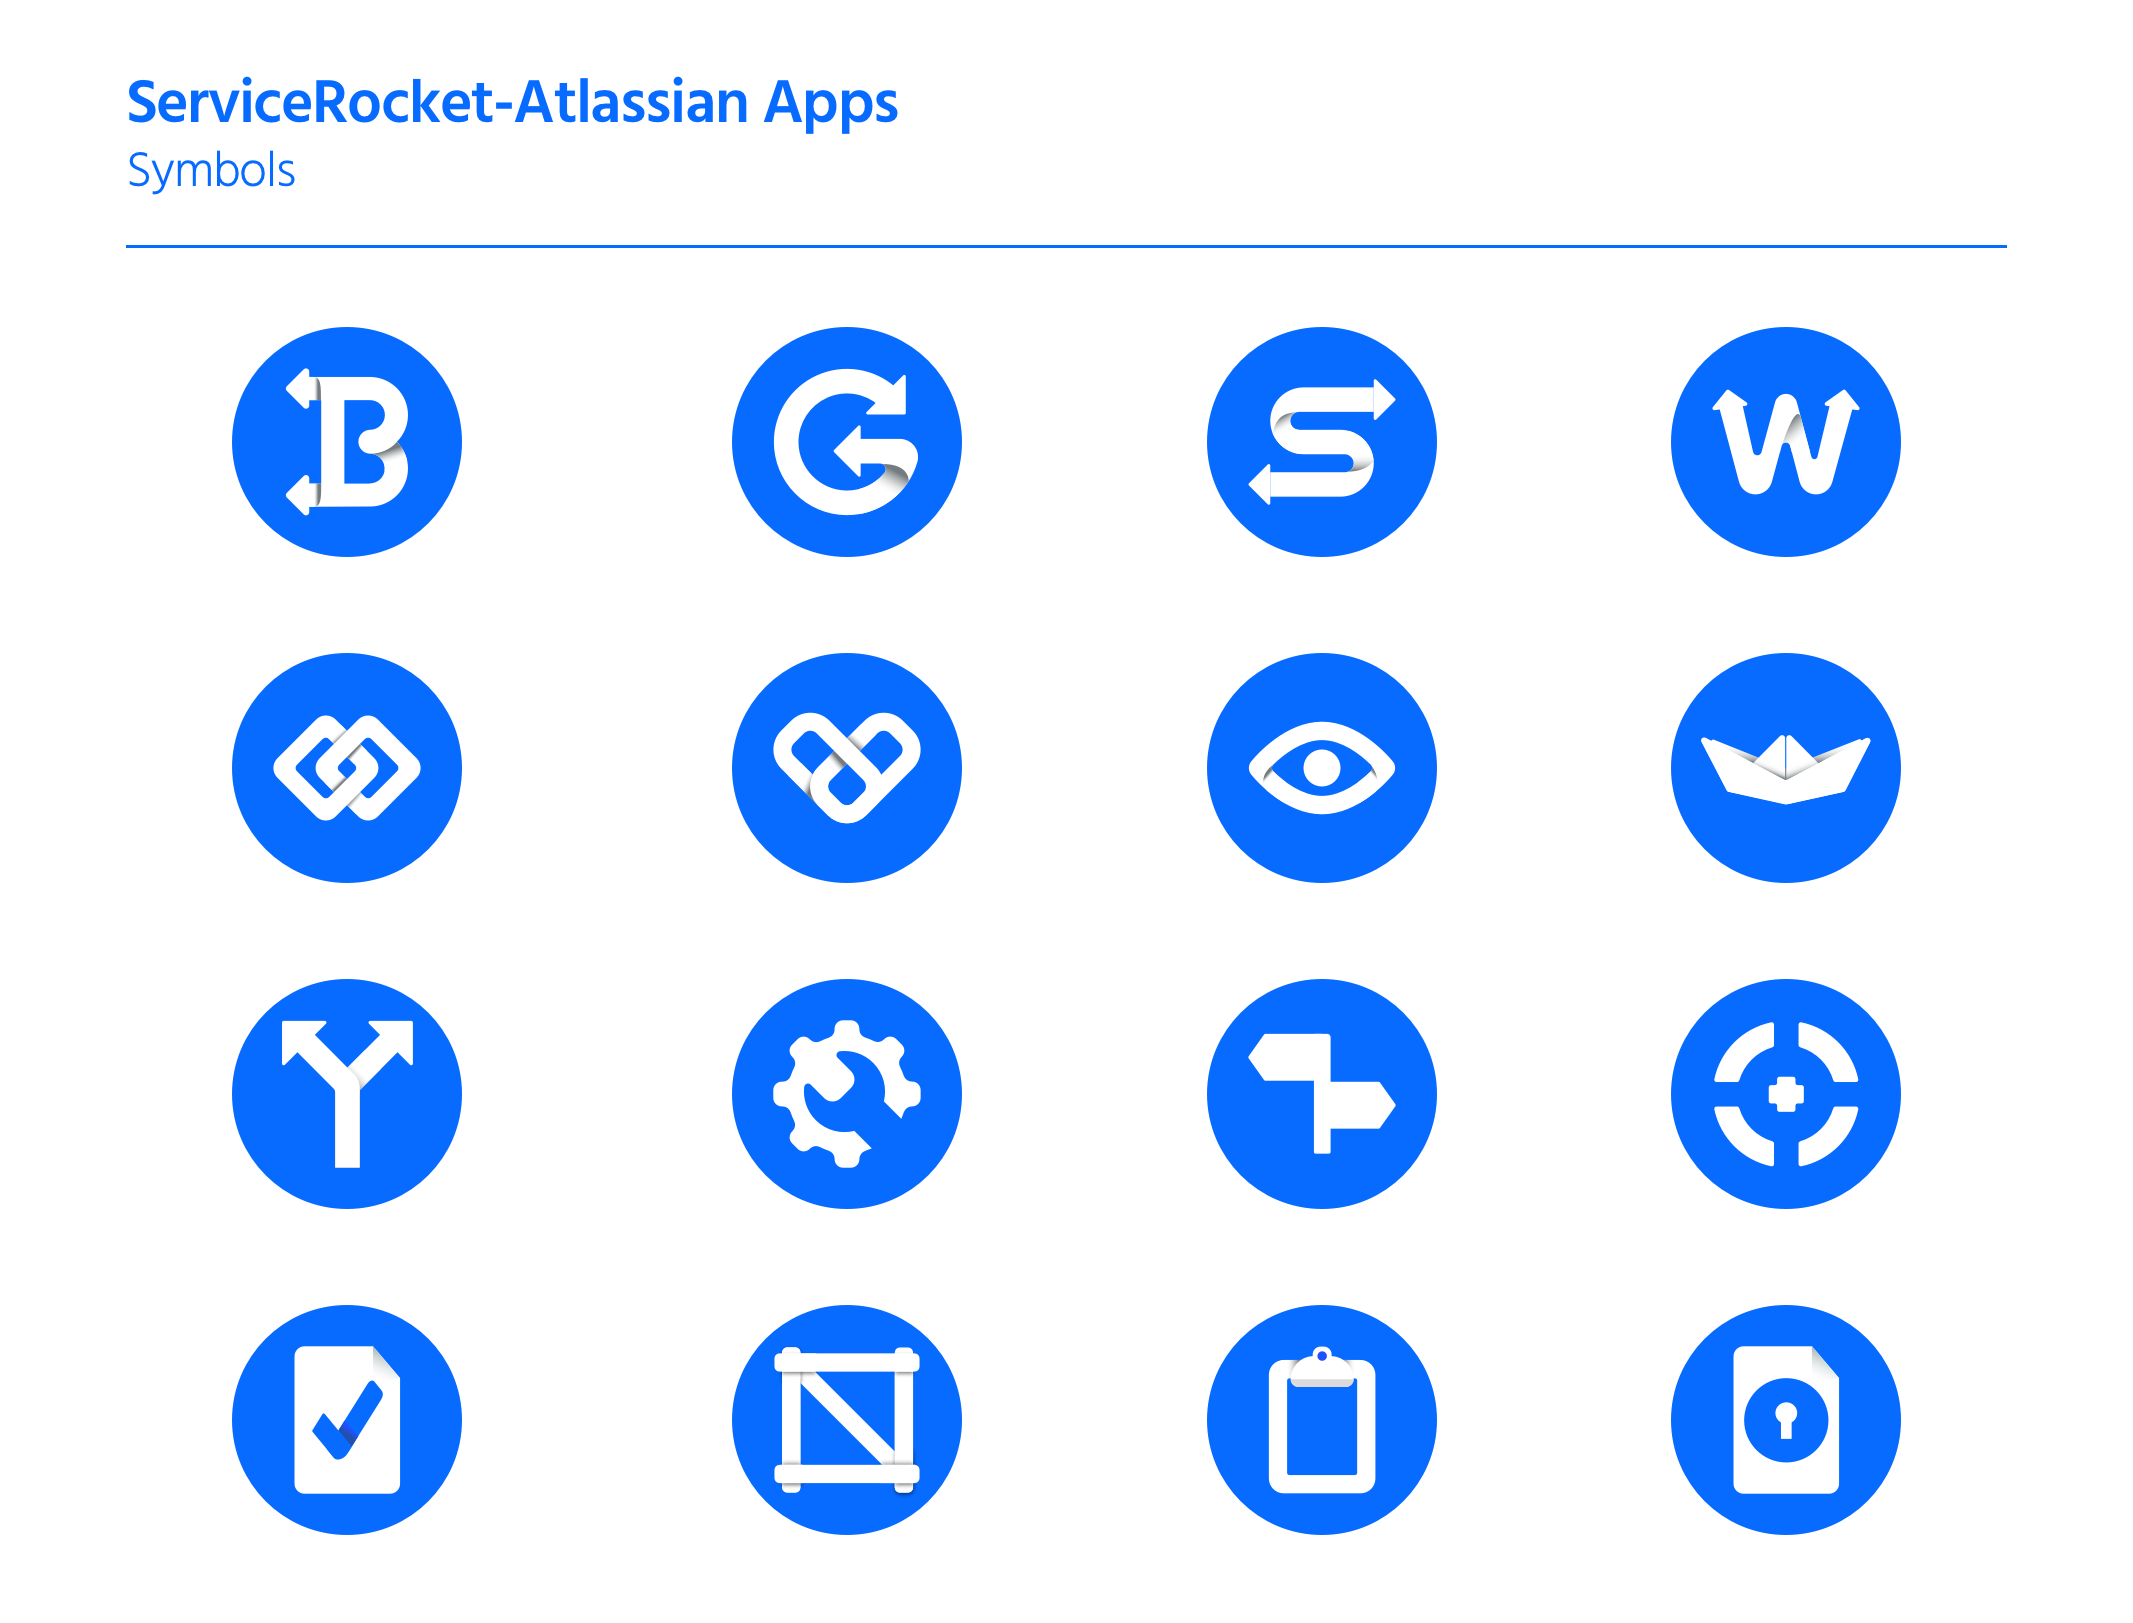 ServiceRocket Apps symbols